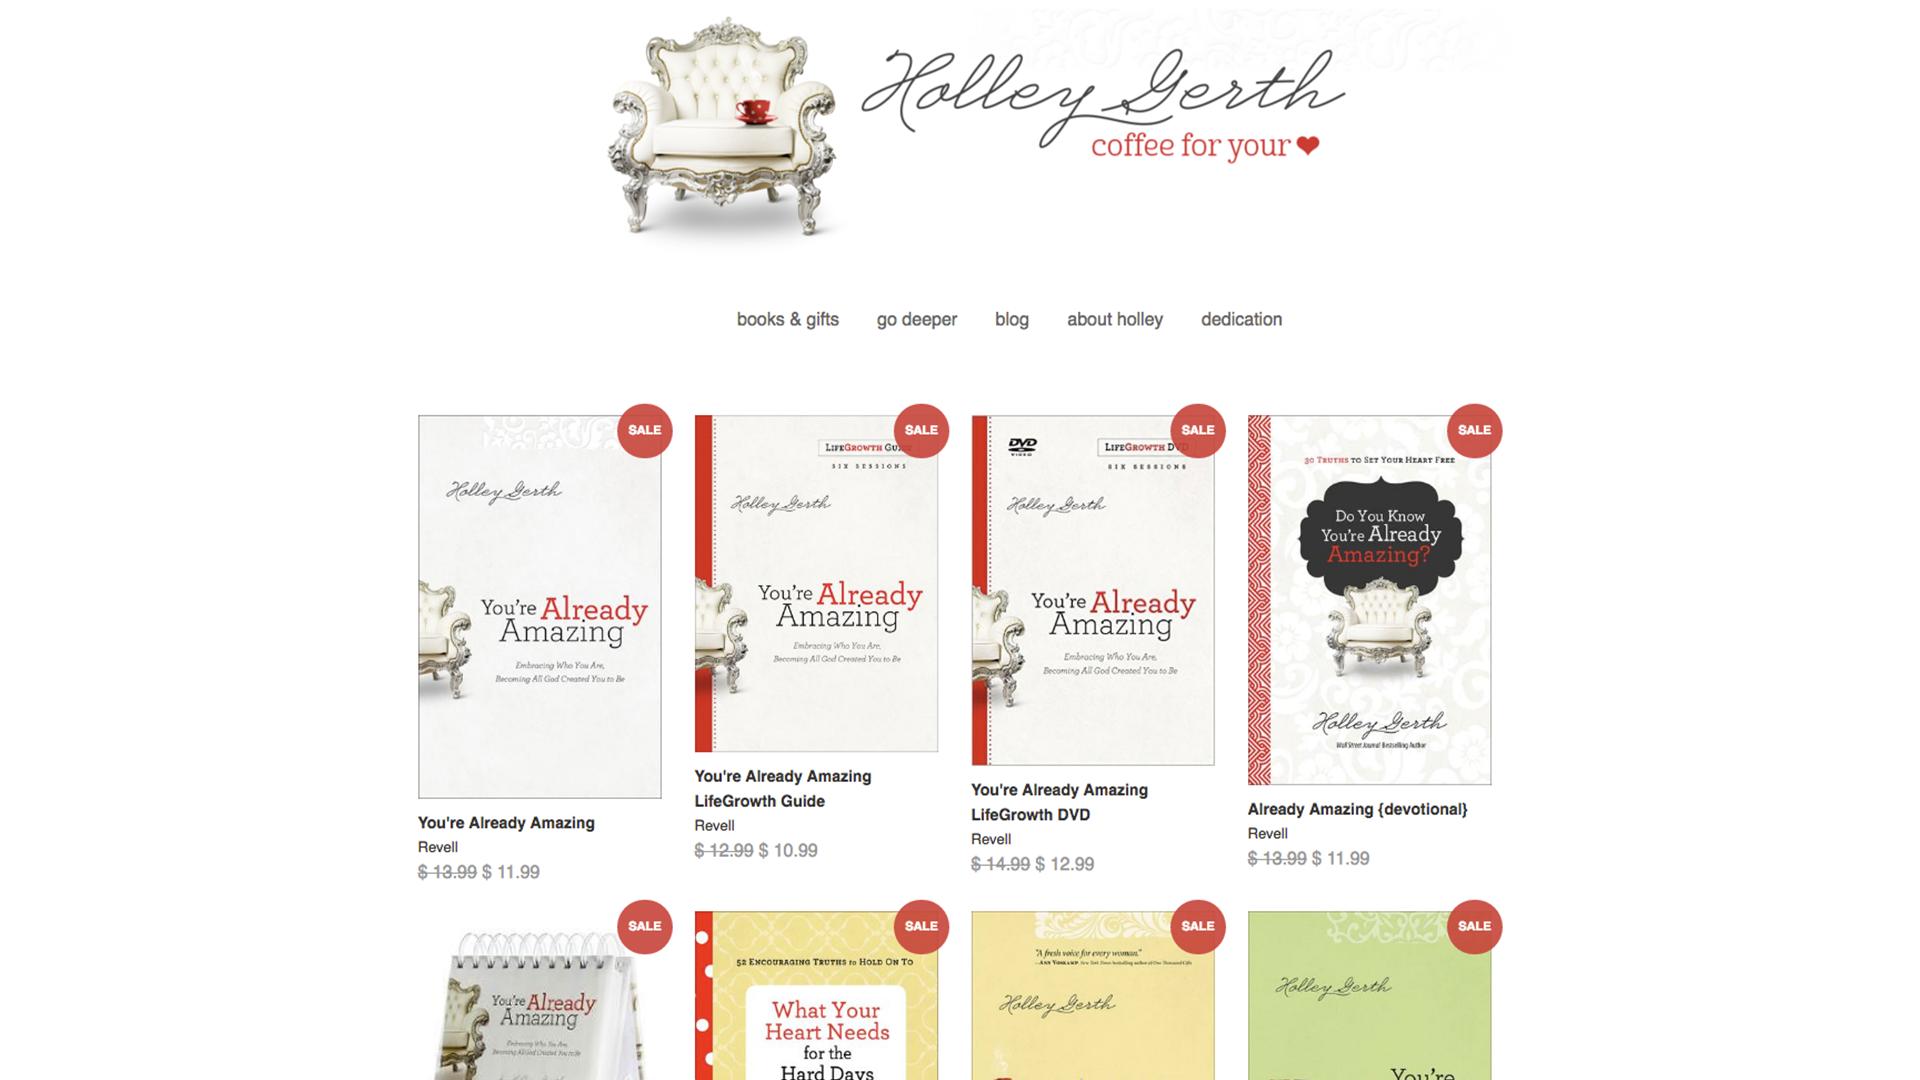 holley-gerth.com